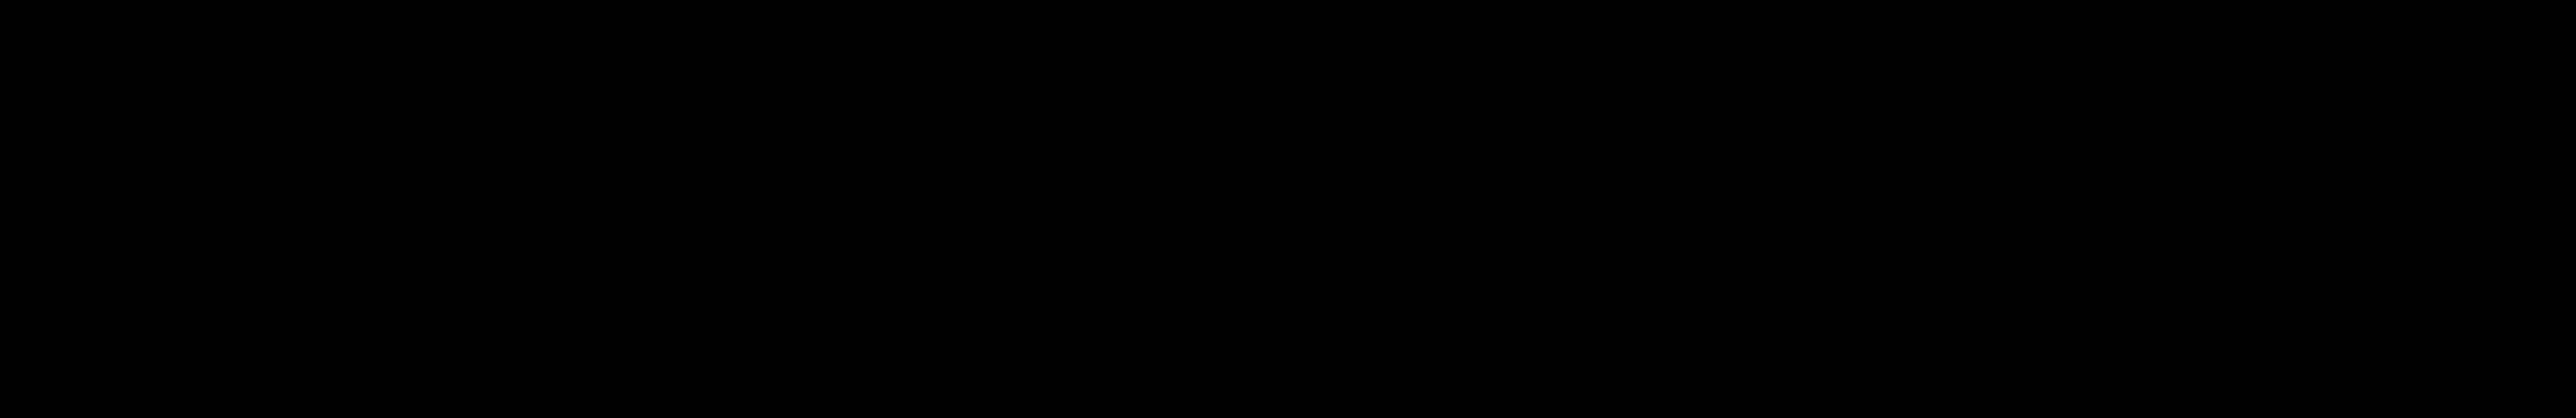 https://anniesophia.com/wp-content/uploads/2017/09/Herald_Sun_logo_logotype.png